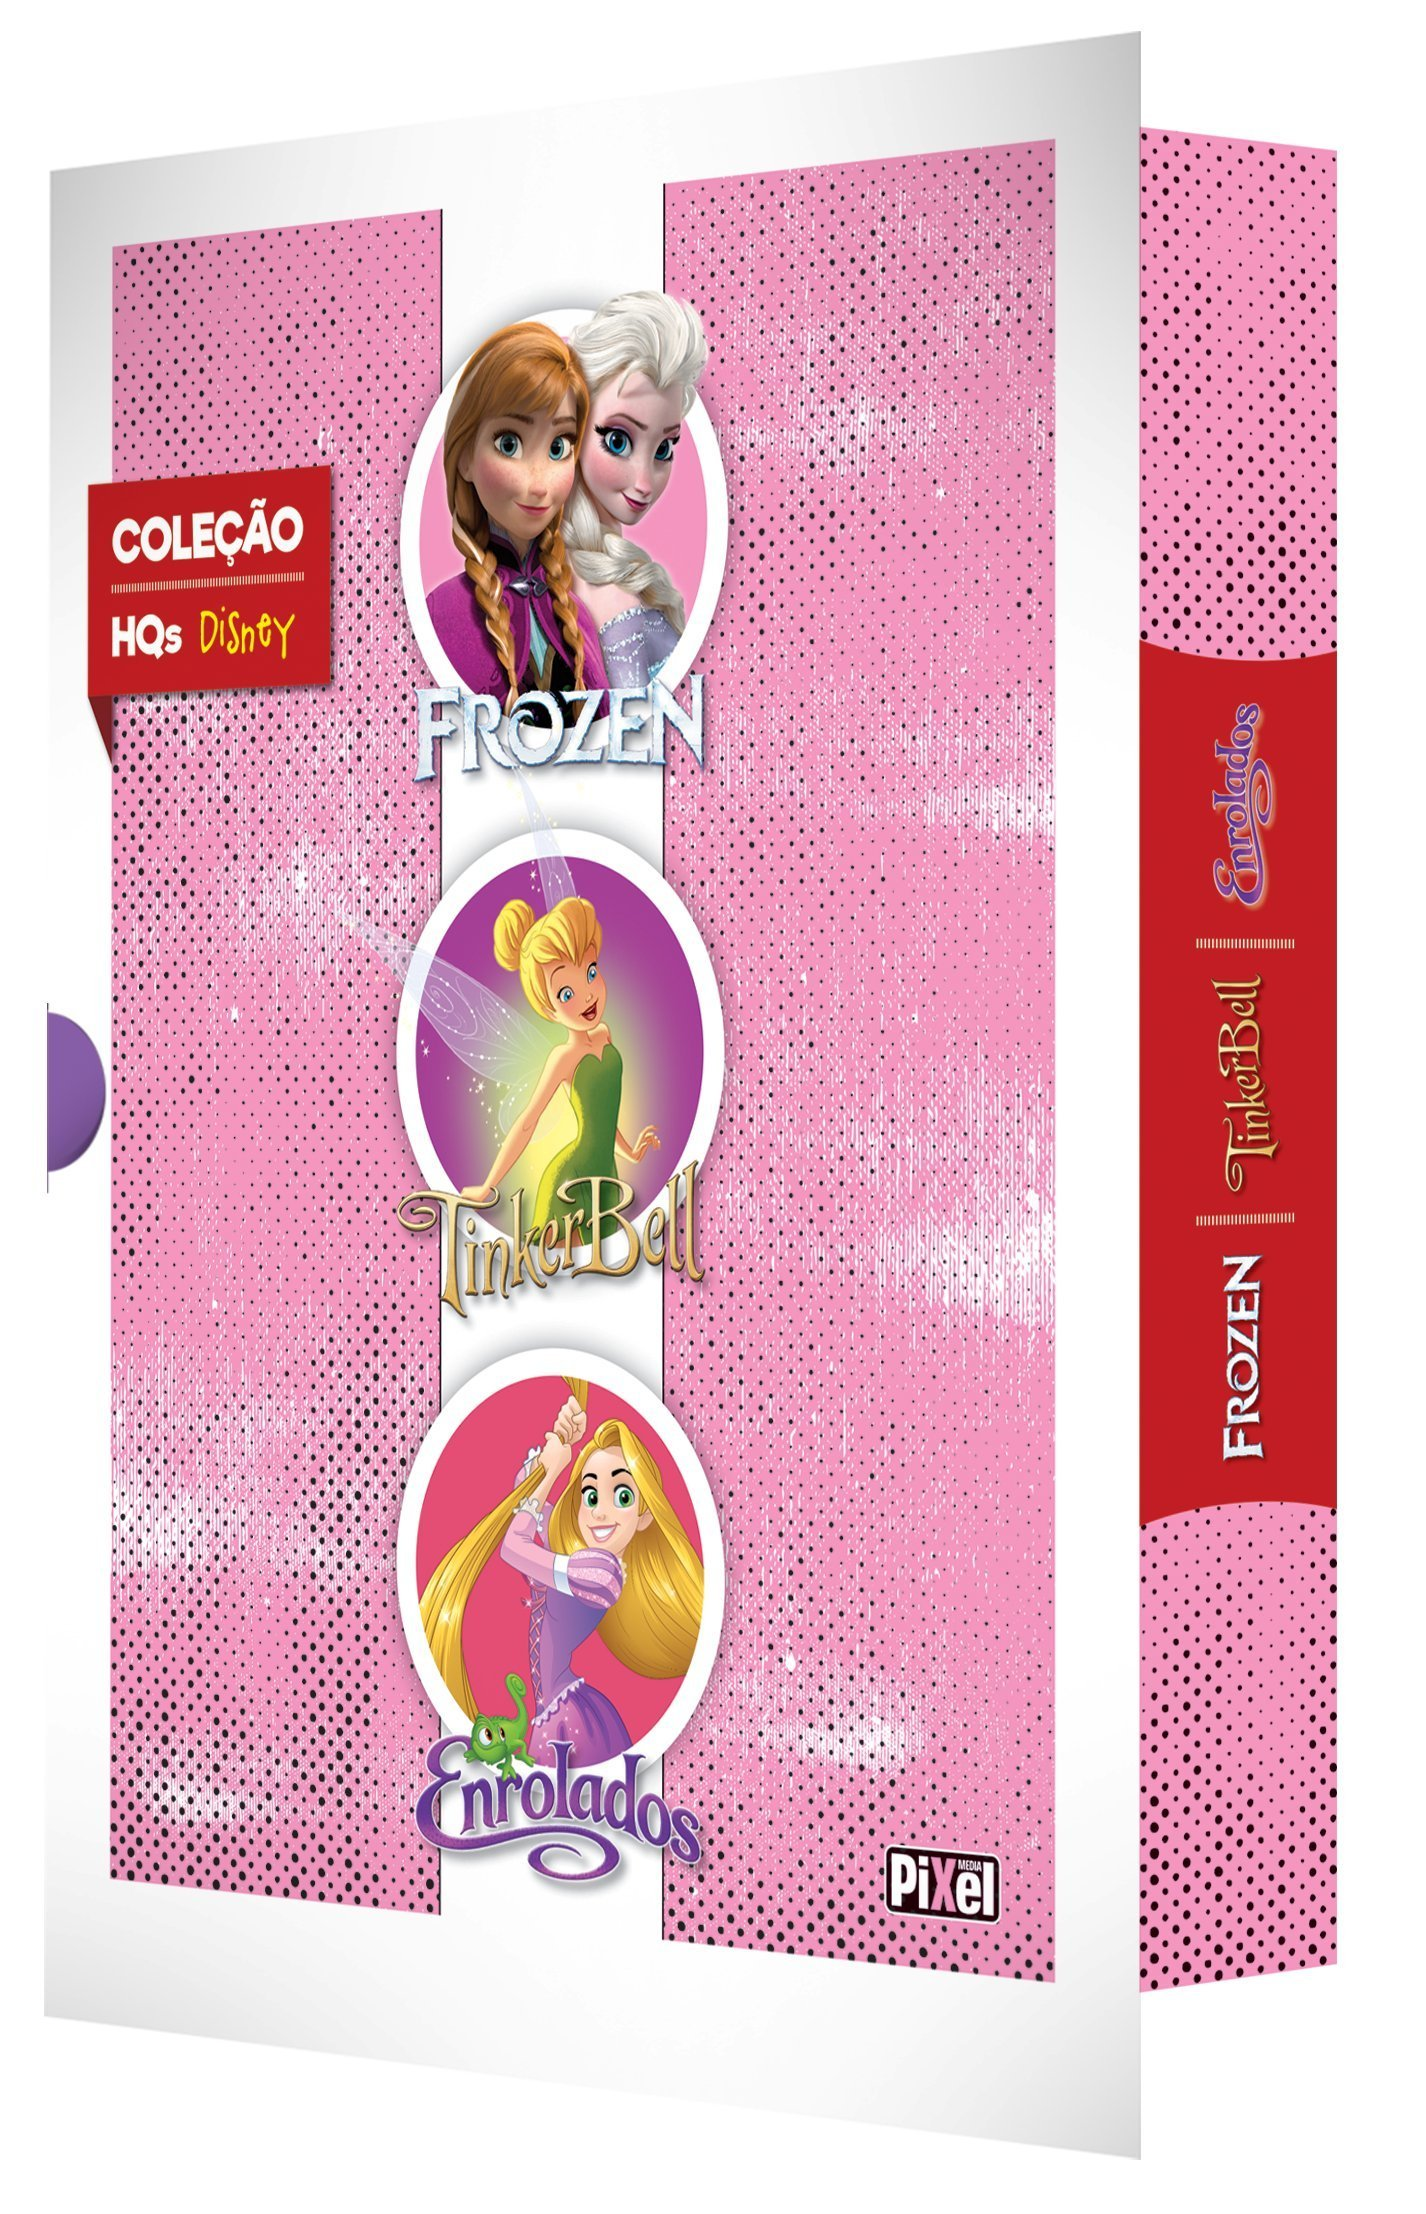 HQS Disney 1 - Caixa - 9788579025693 - Livros na Amazon Brasil bdfcf1a7064